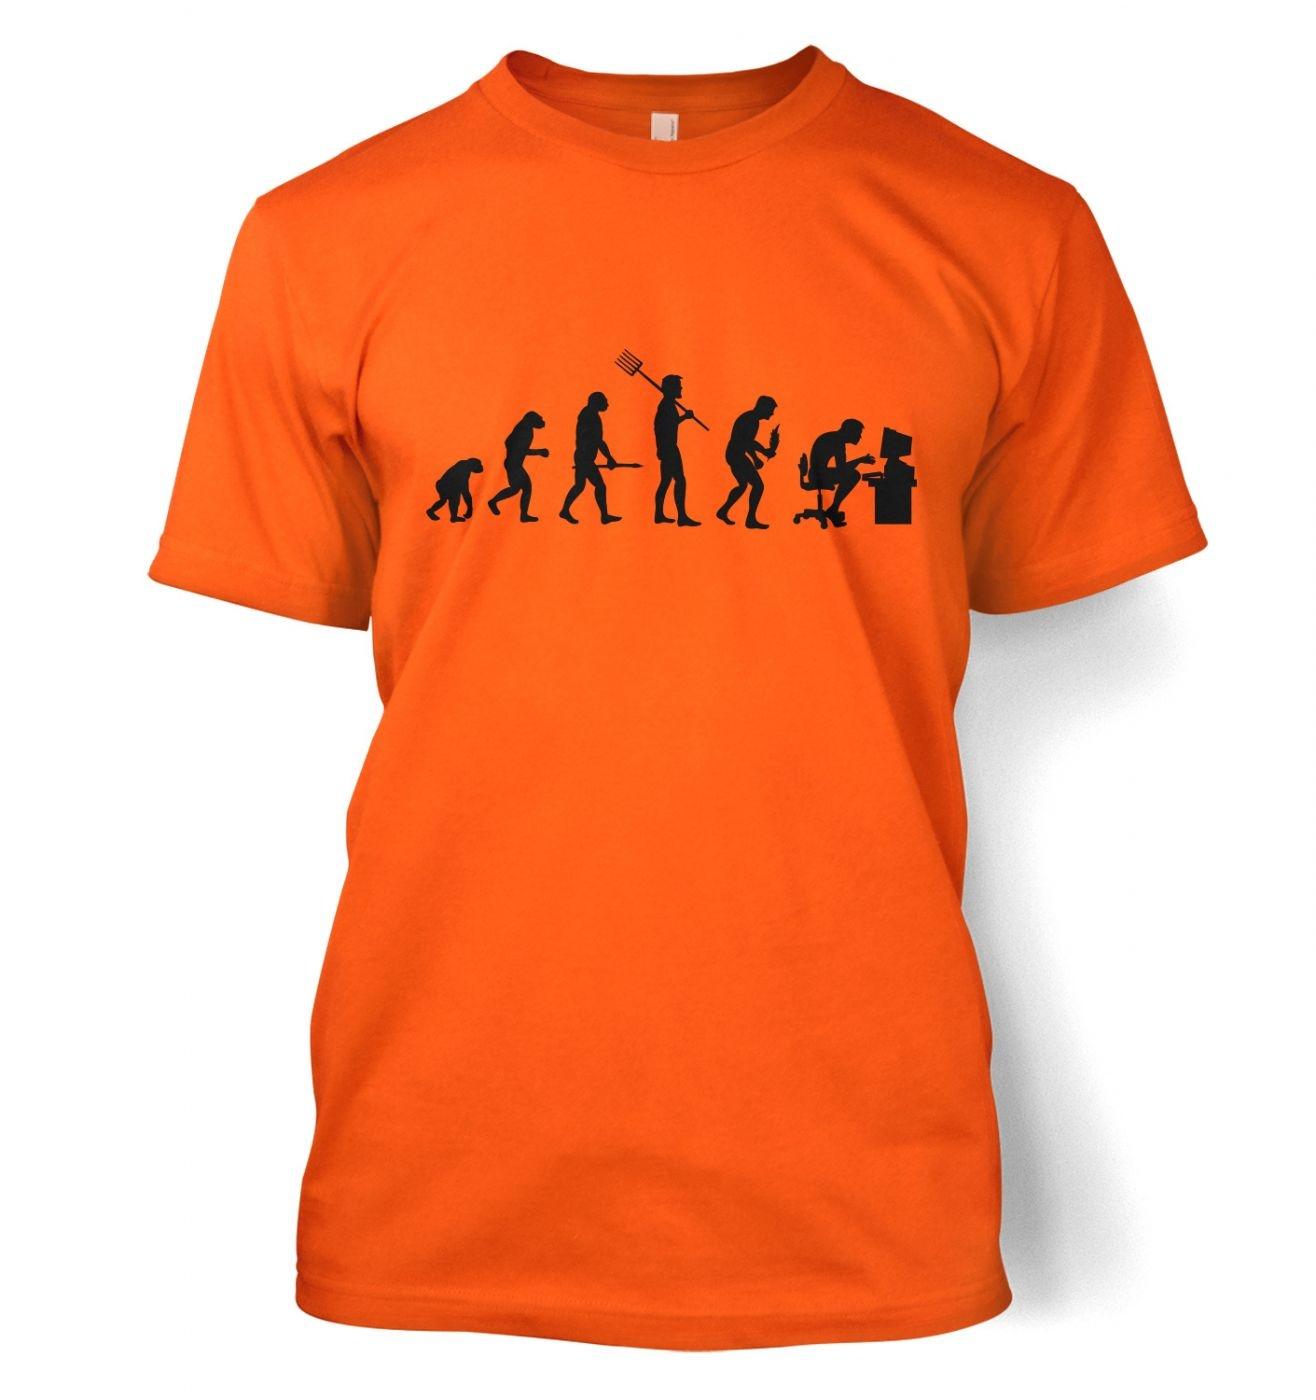 Evolution of a geeky man (black detail) t-shirt